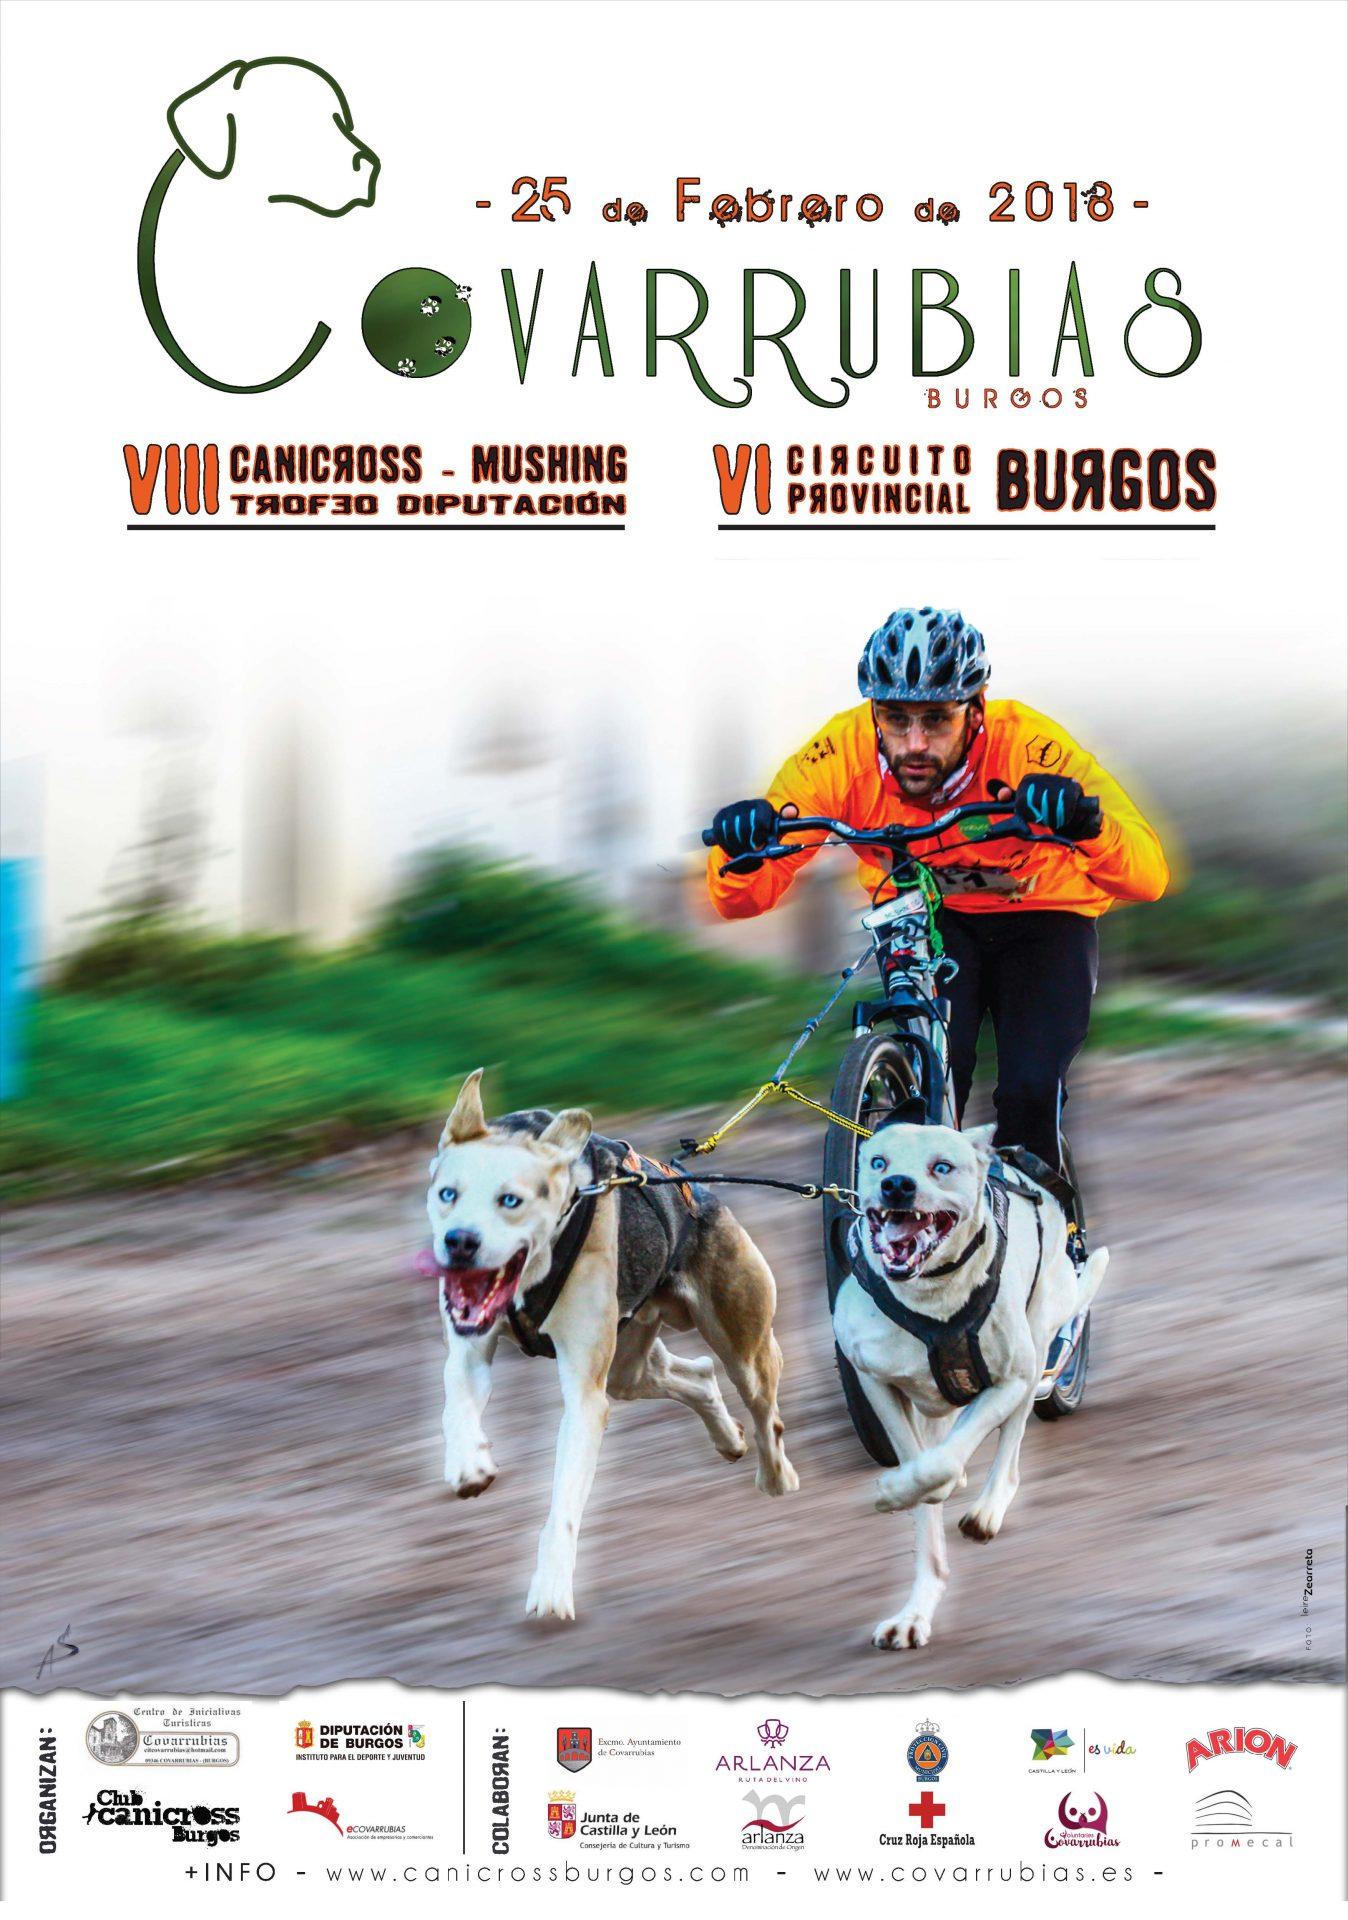 canicross covarrubias 2018